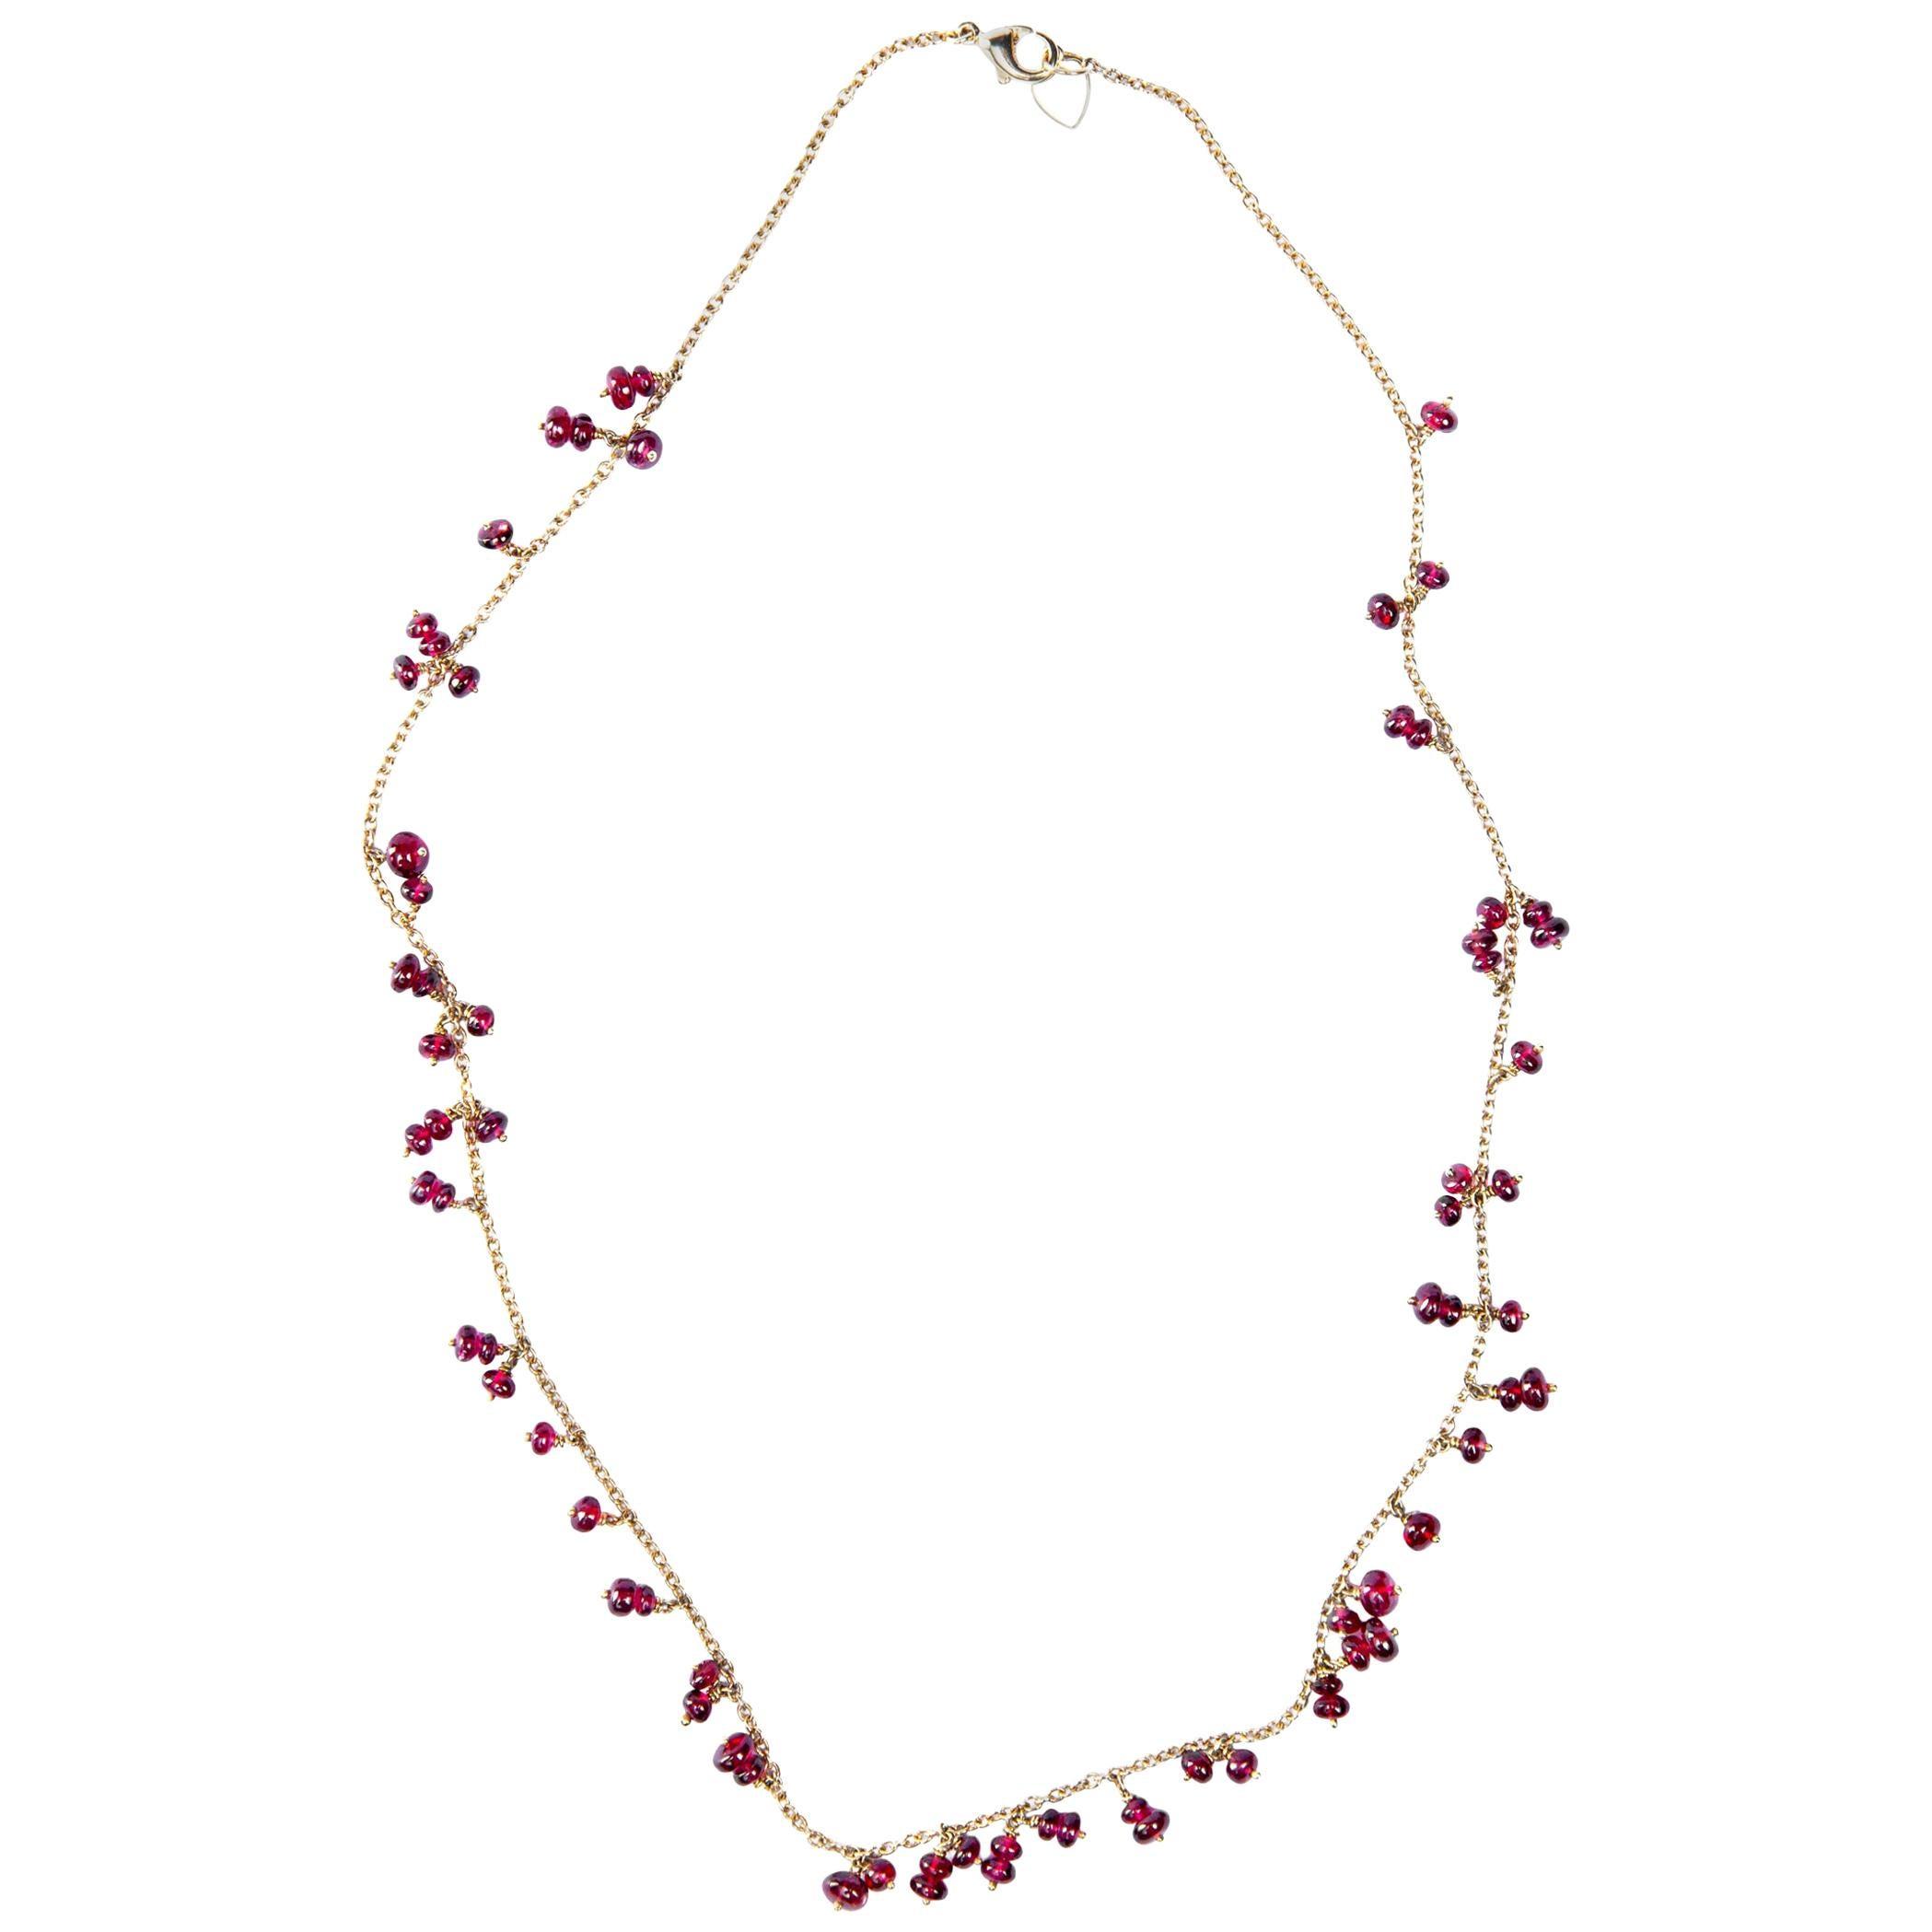 Alex Jona Burmese Red Spinel 18 Karat Yellow Gold Necklace